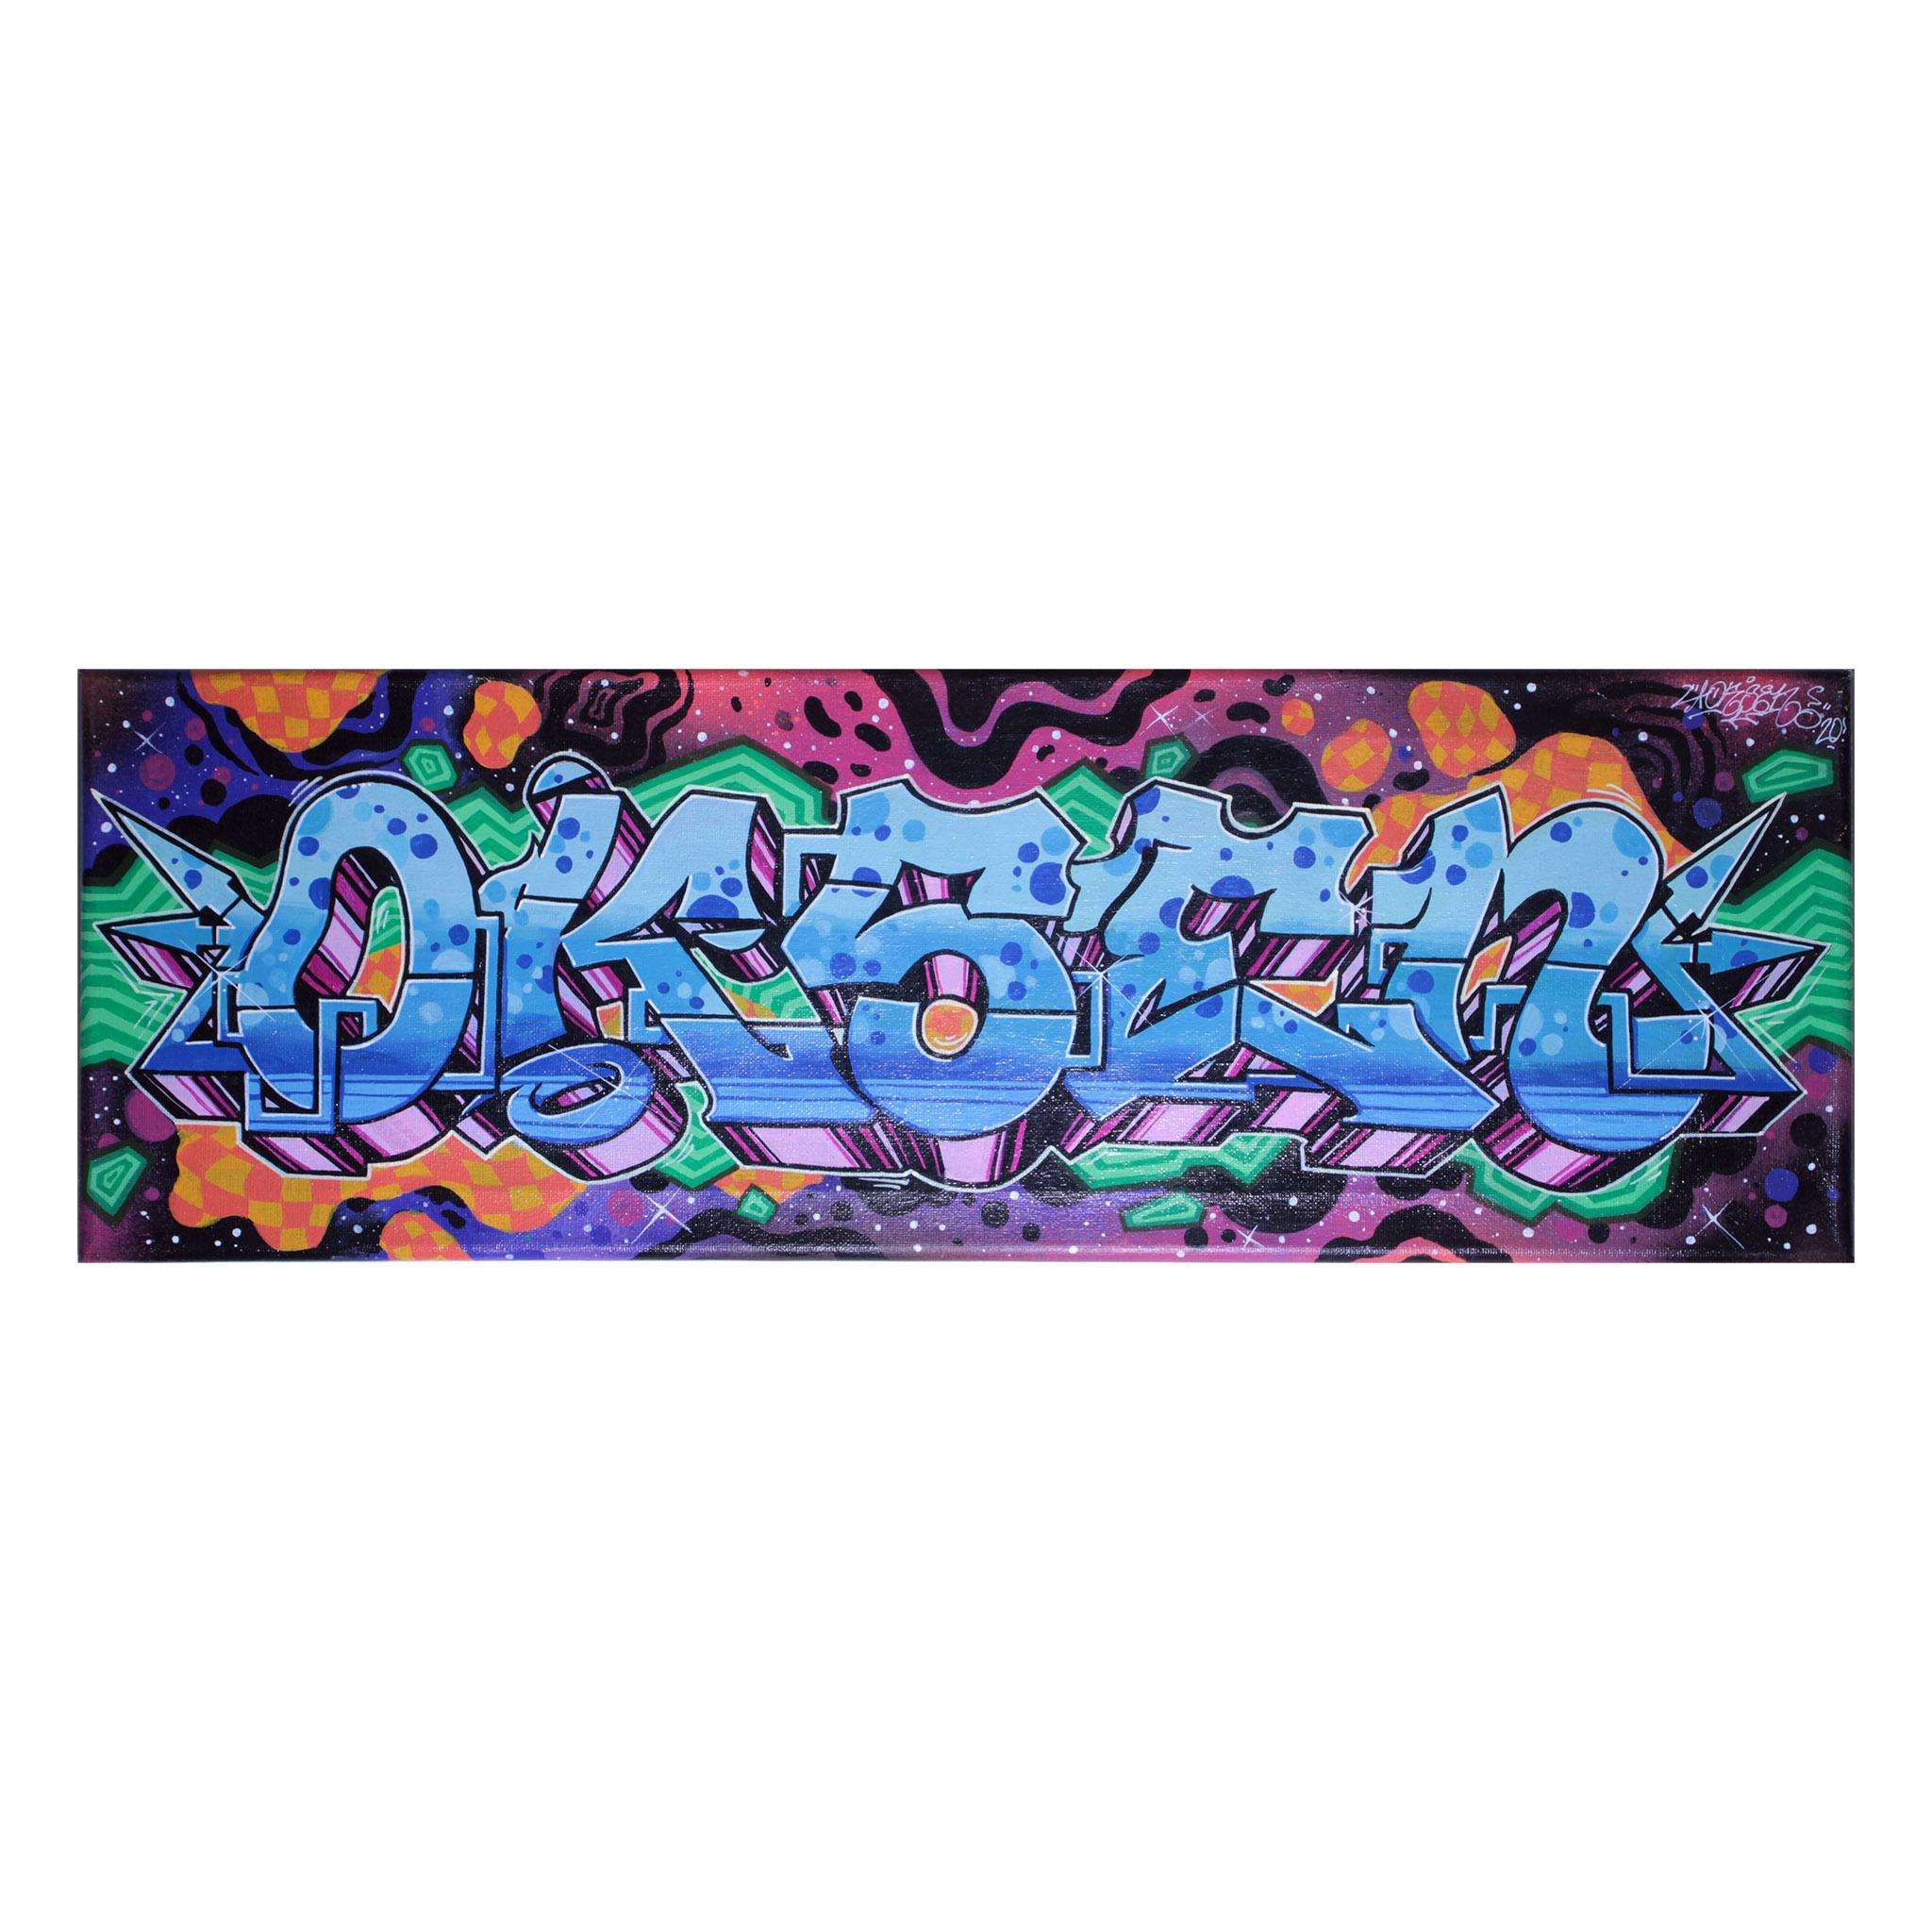 NESK 2020 painting